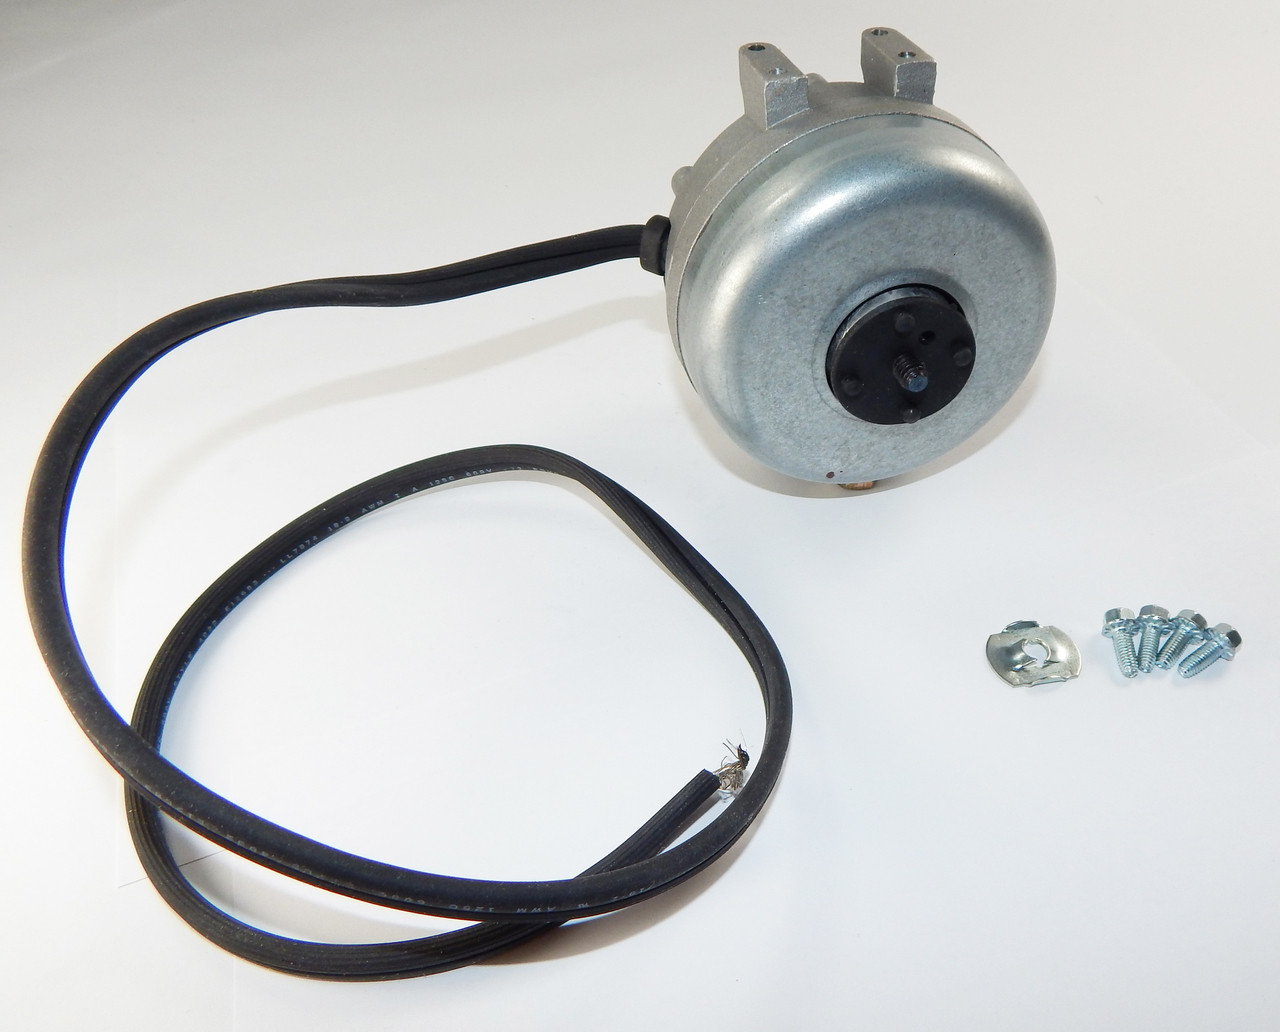 16 Watt 1550 RPM CWLE 115V Unit Bearing Refrigeration Fasco Electric Motor # UB566